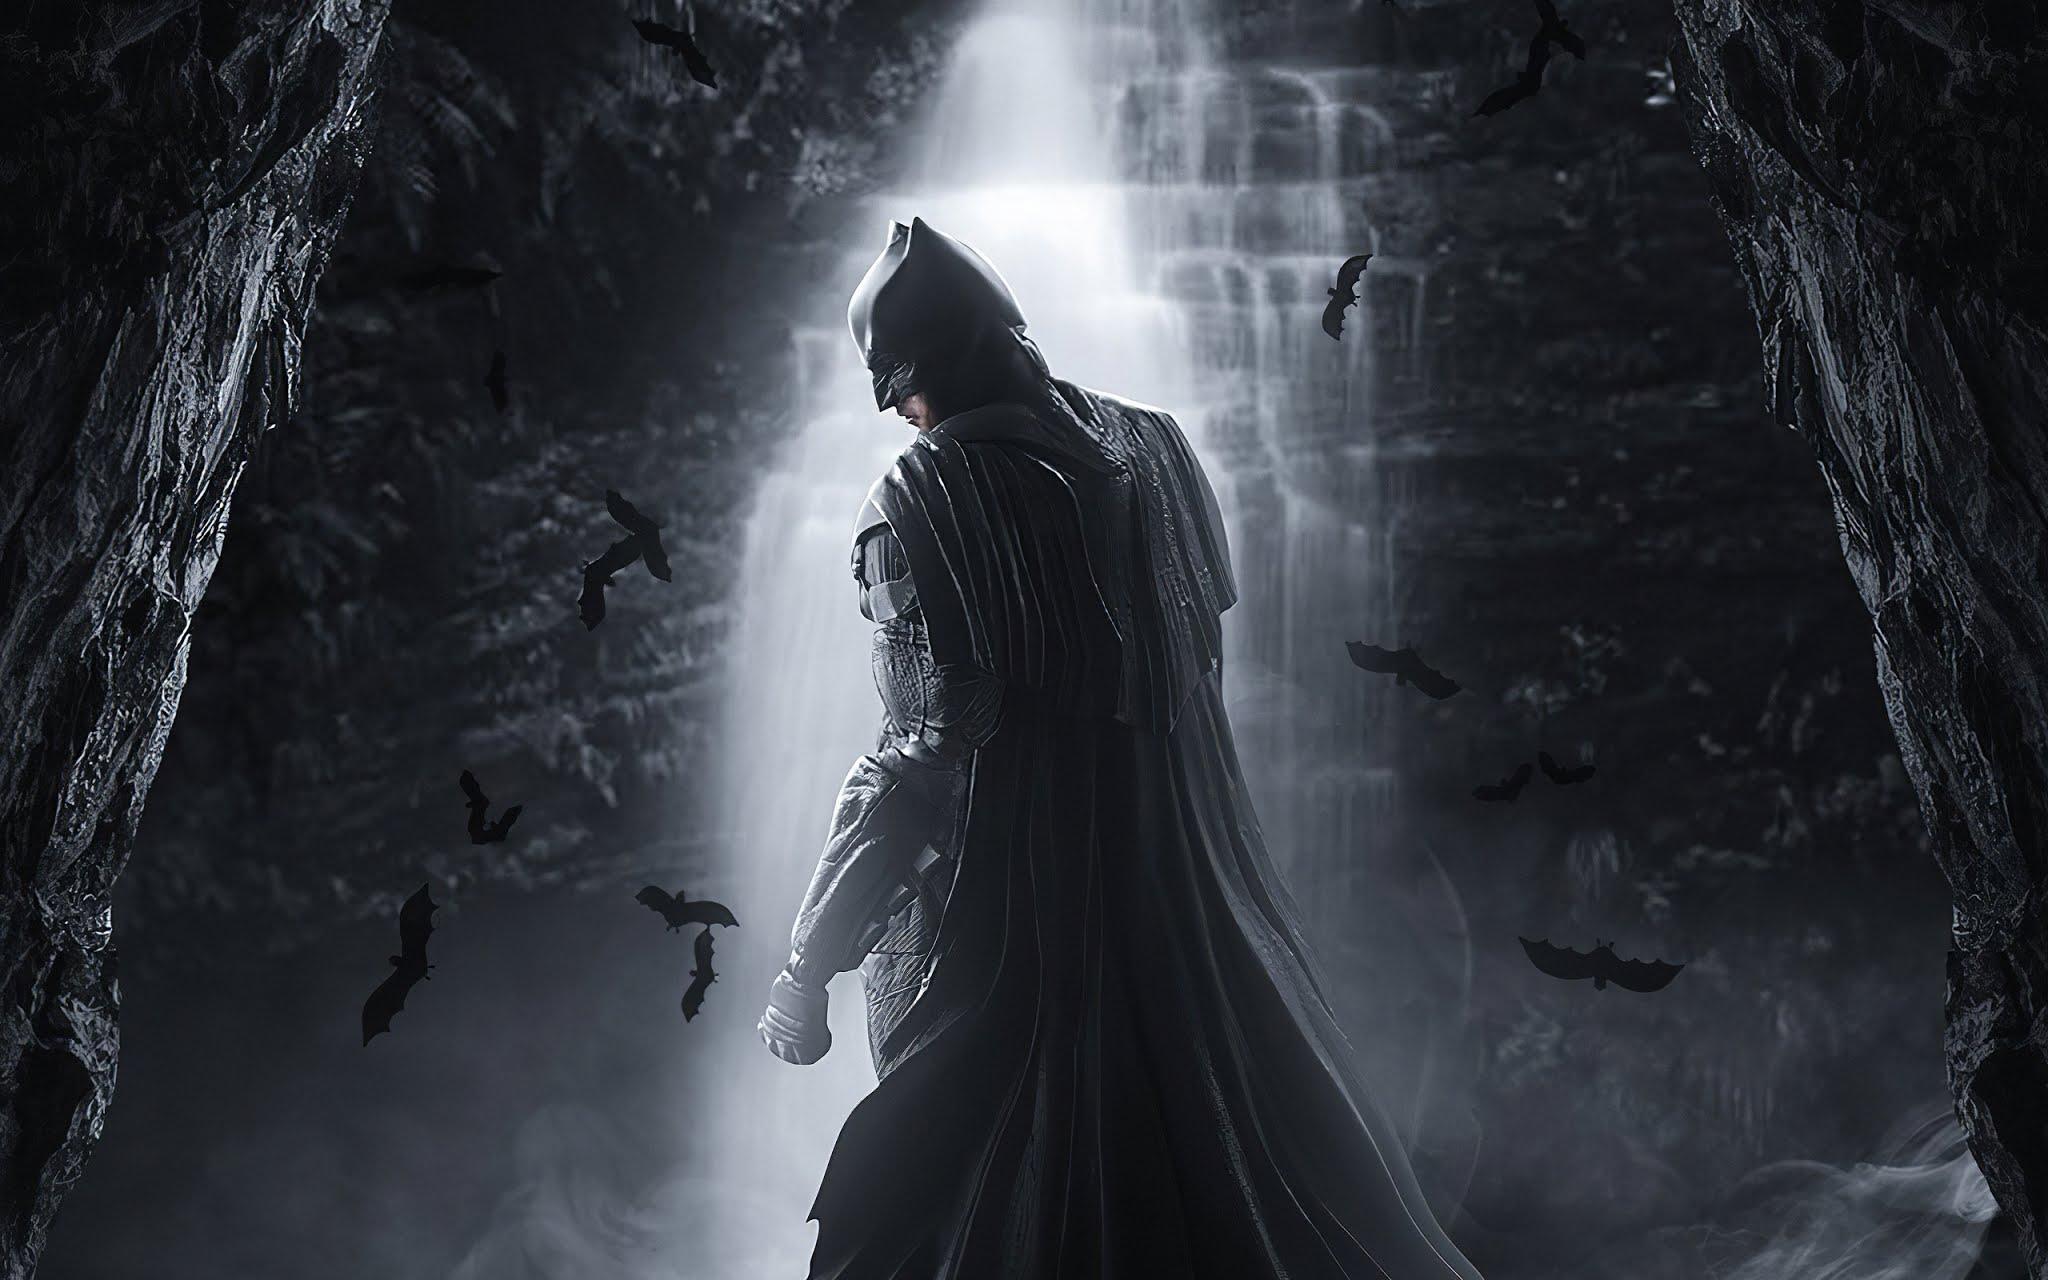 Batman Dark Knight Hd wallpaper by itsharman on DeviantArt